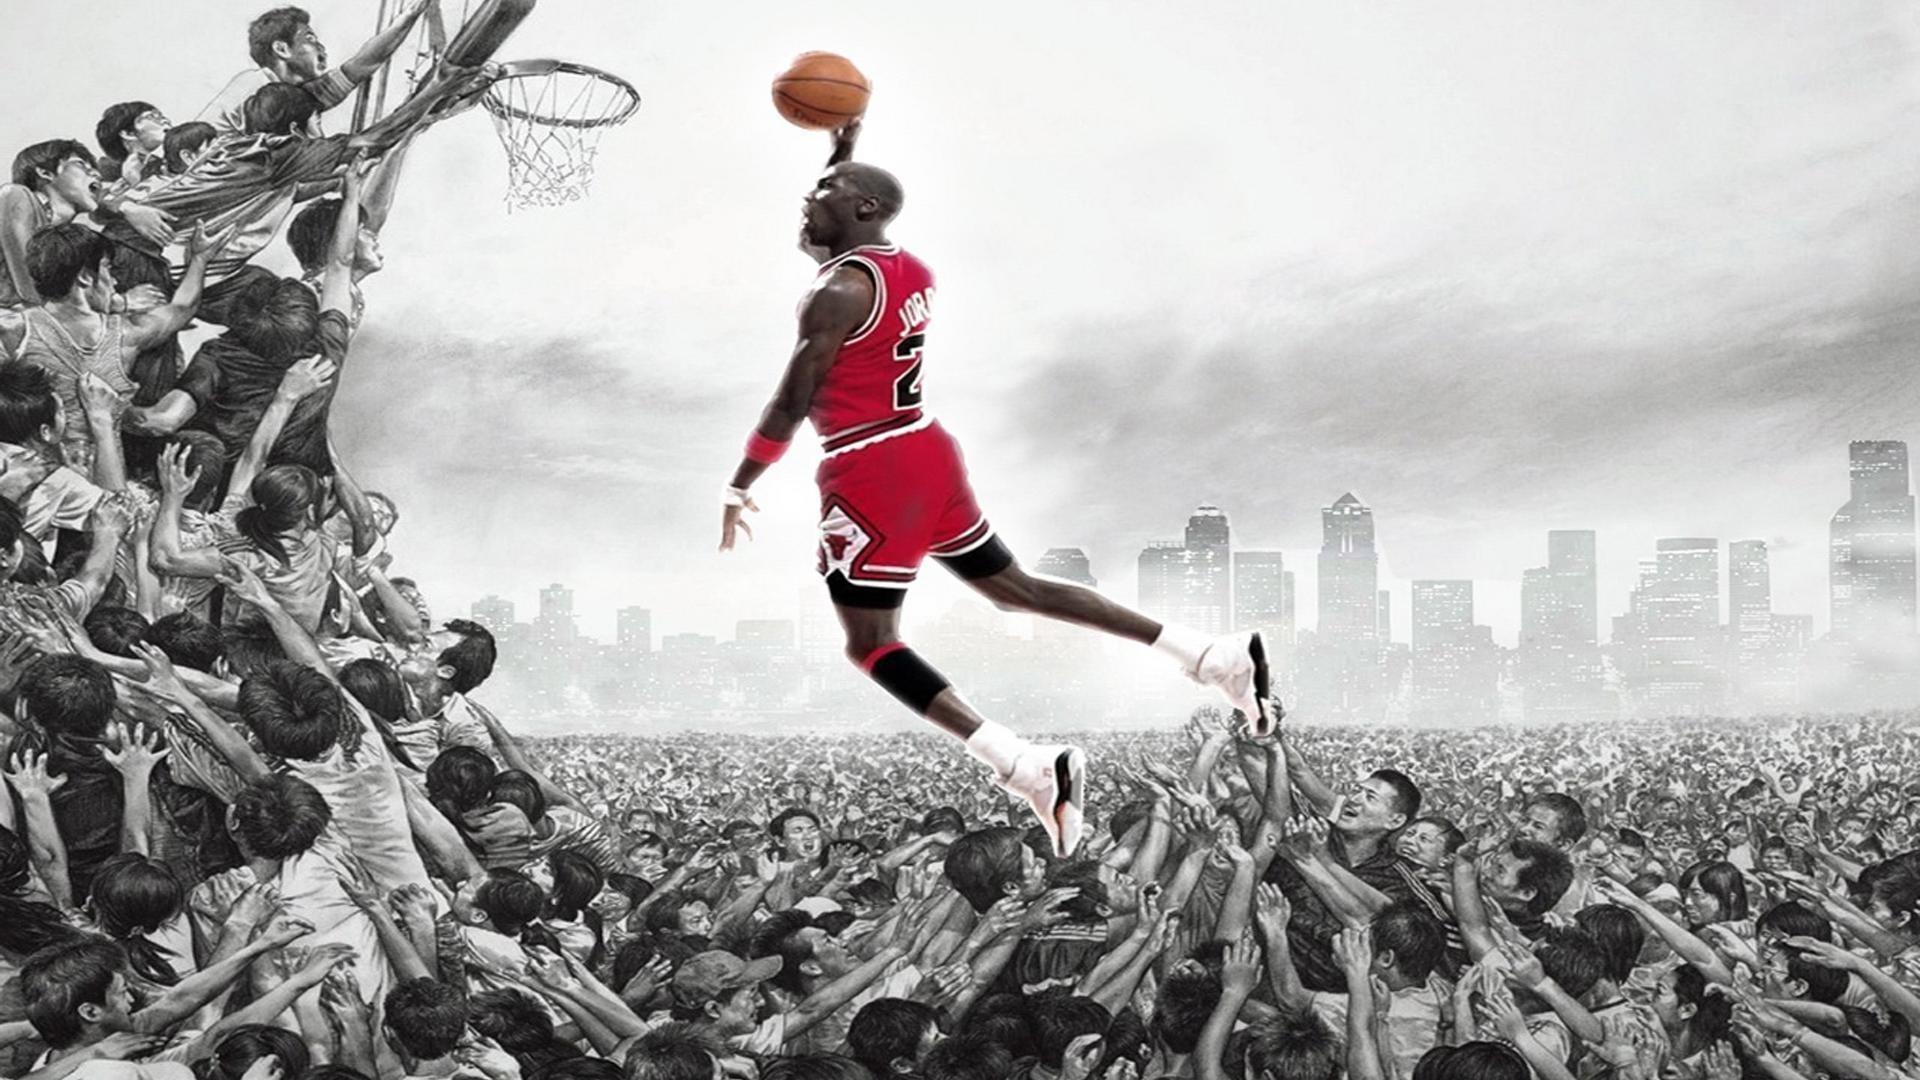 Michael Jordan Dunk Wallpaper   fourwallsonly.com